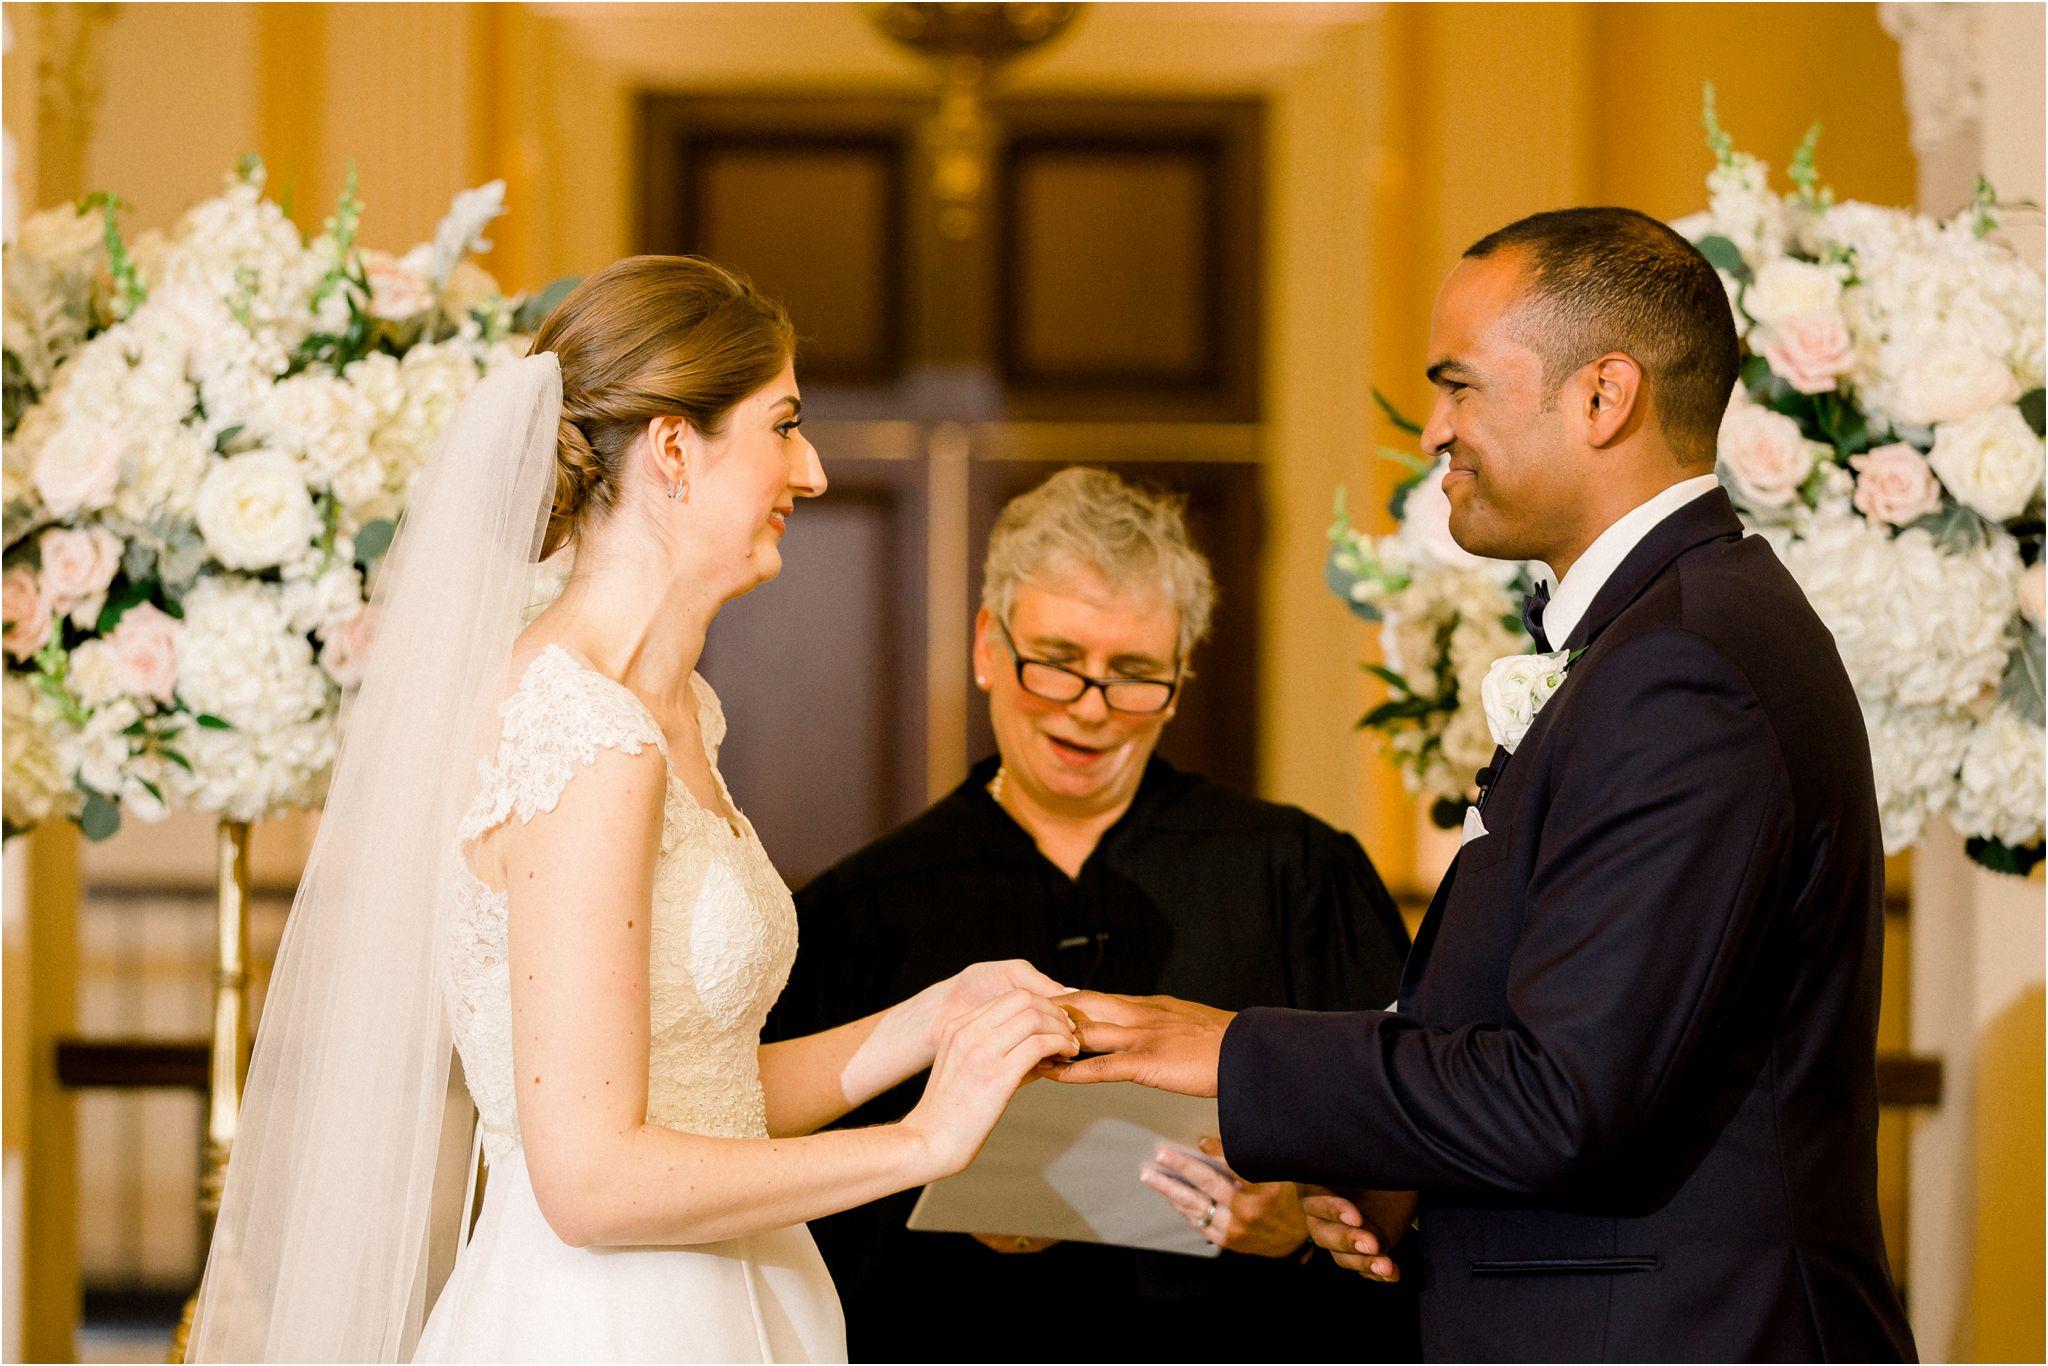 providence-public-library-wedding-images_00031.JPG